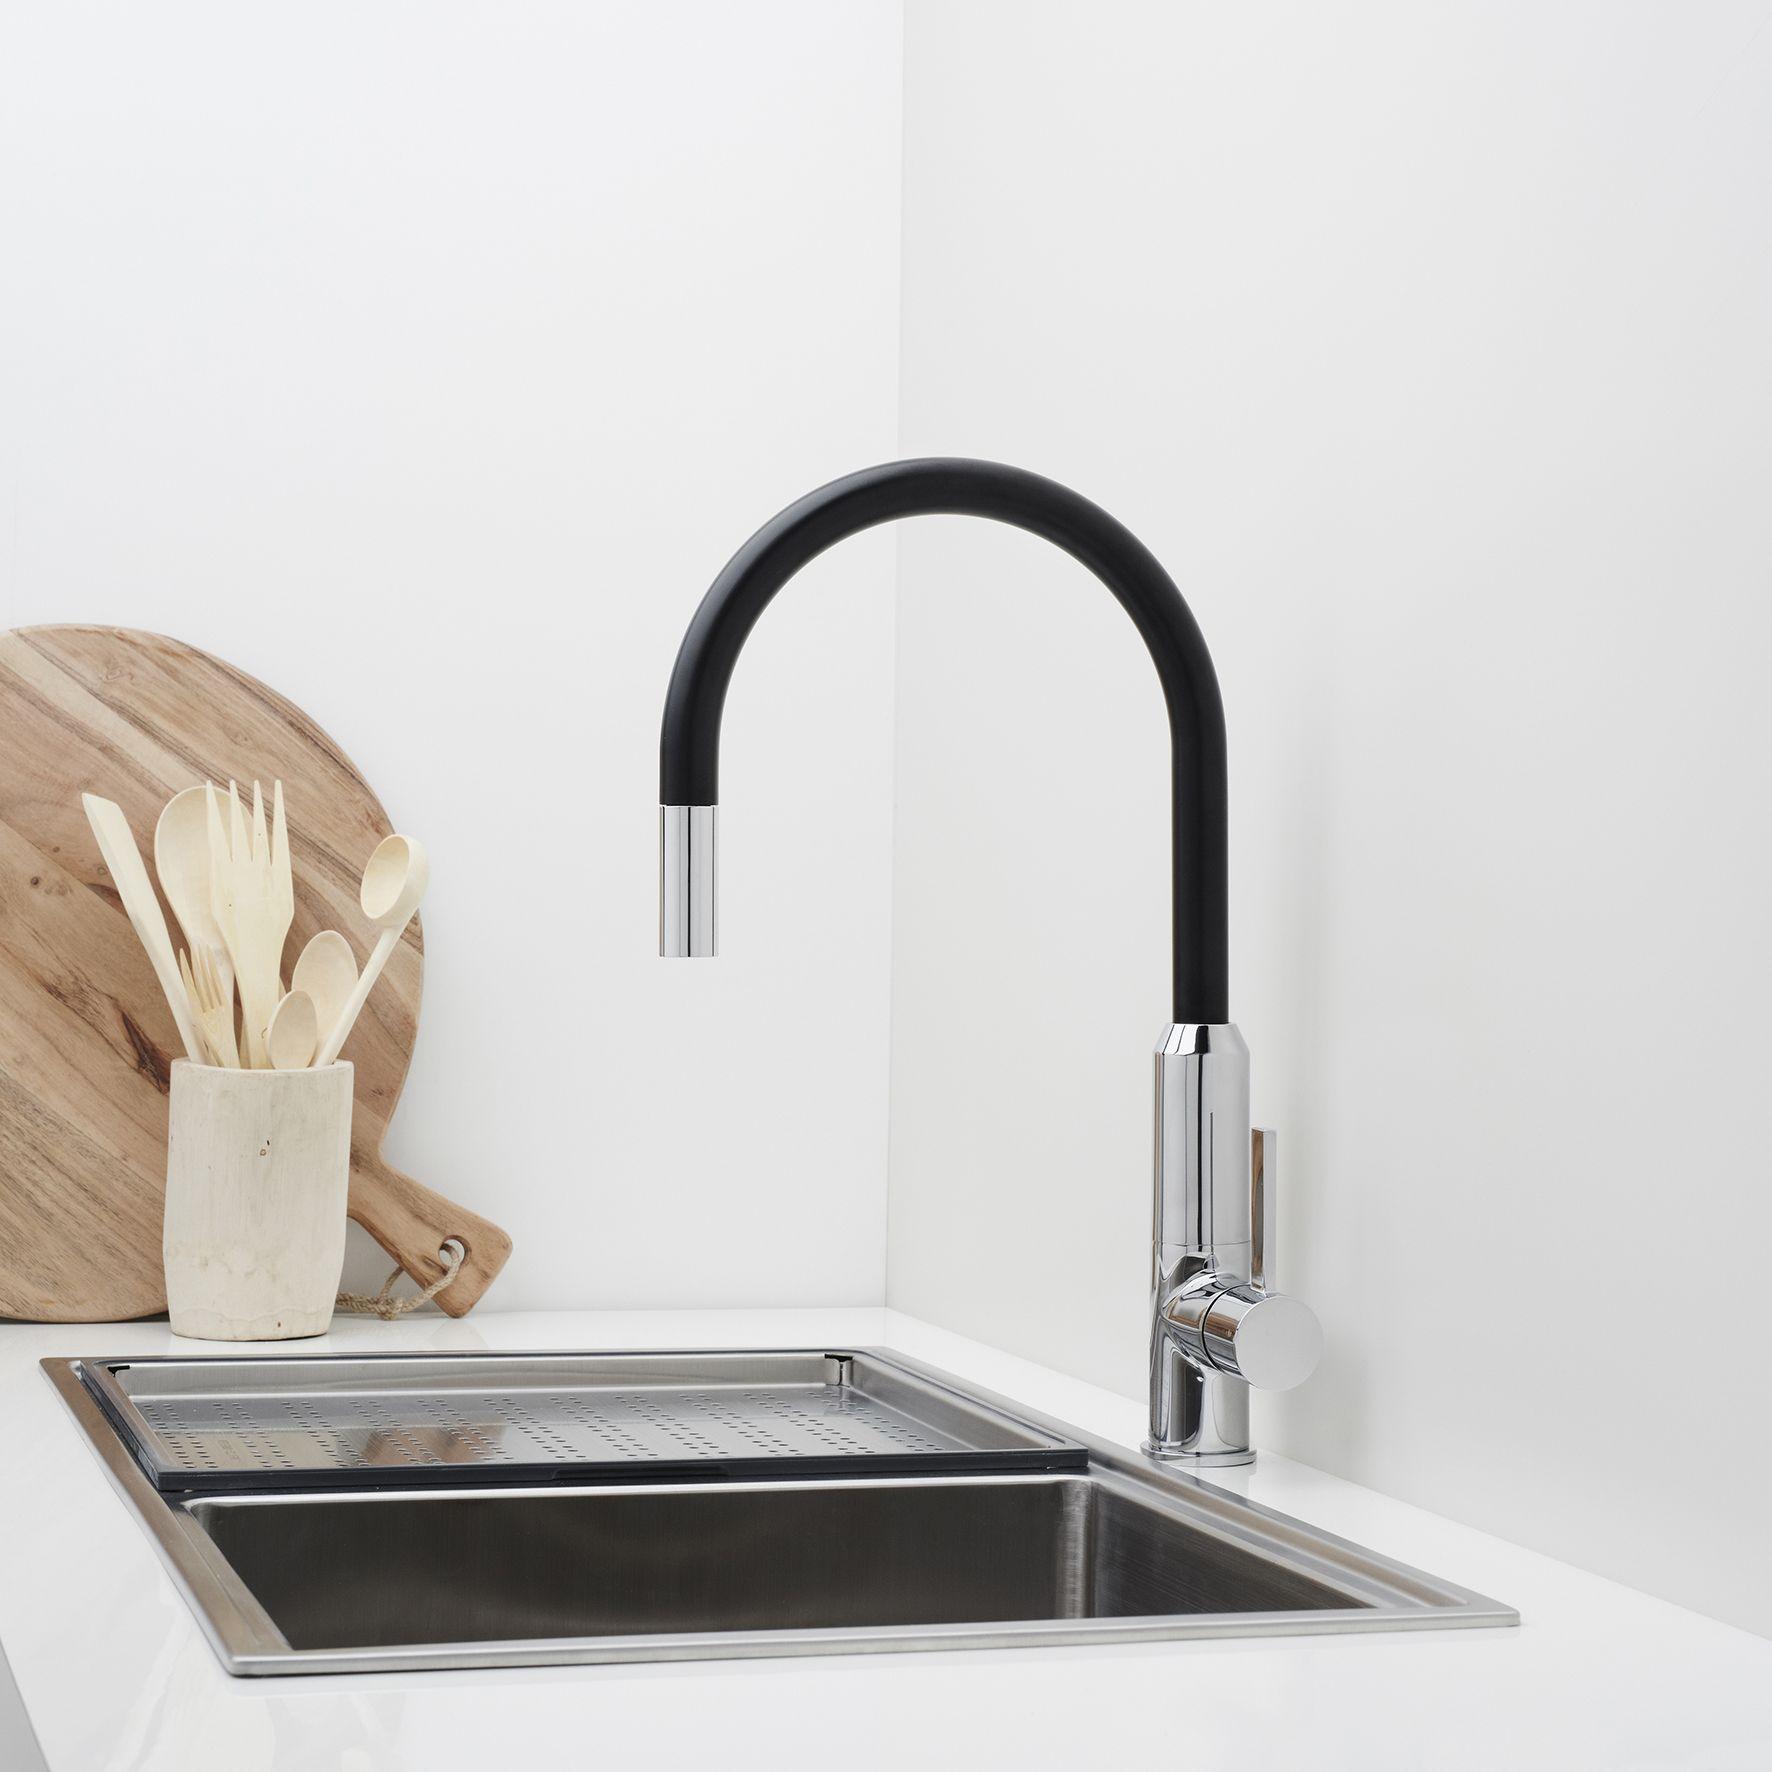 Dorf Vixen Sink Mixer #Dorf #DorfStyle #Styling #Home #Decor ...